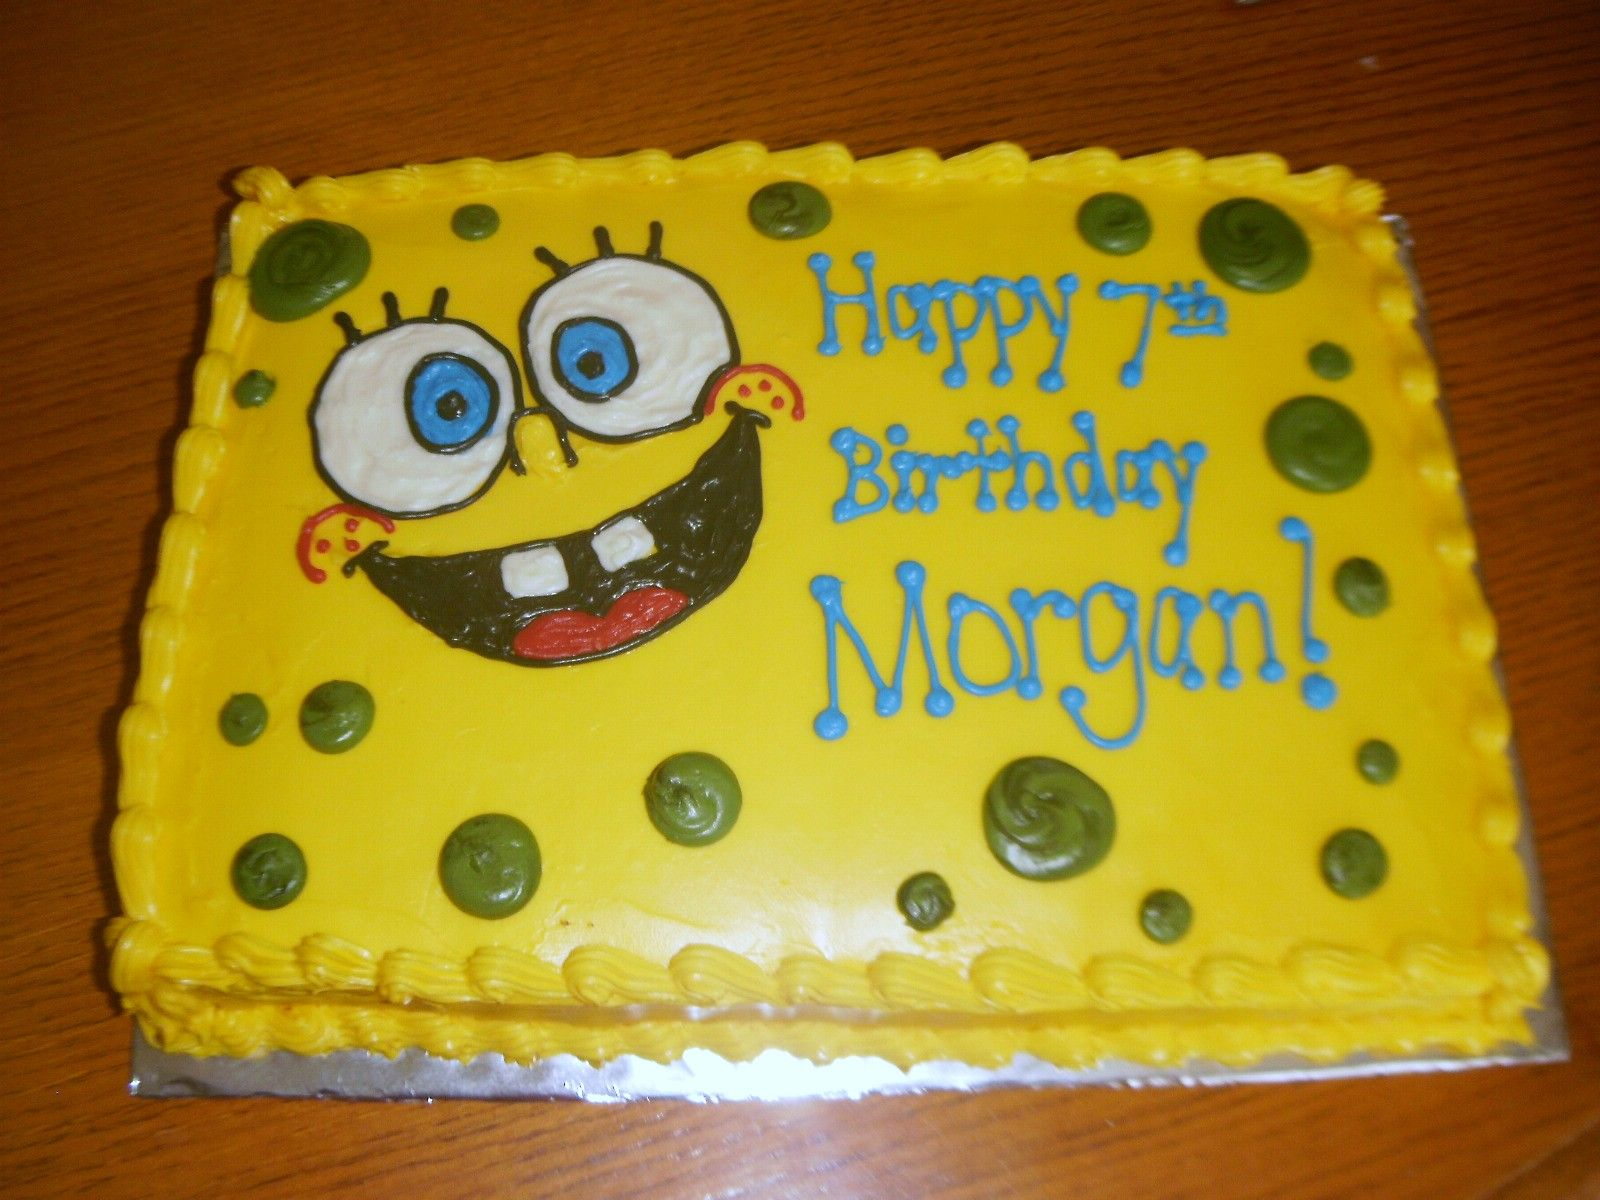 Spongebob cake recipe ingredients